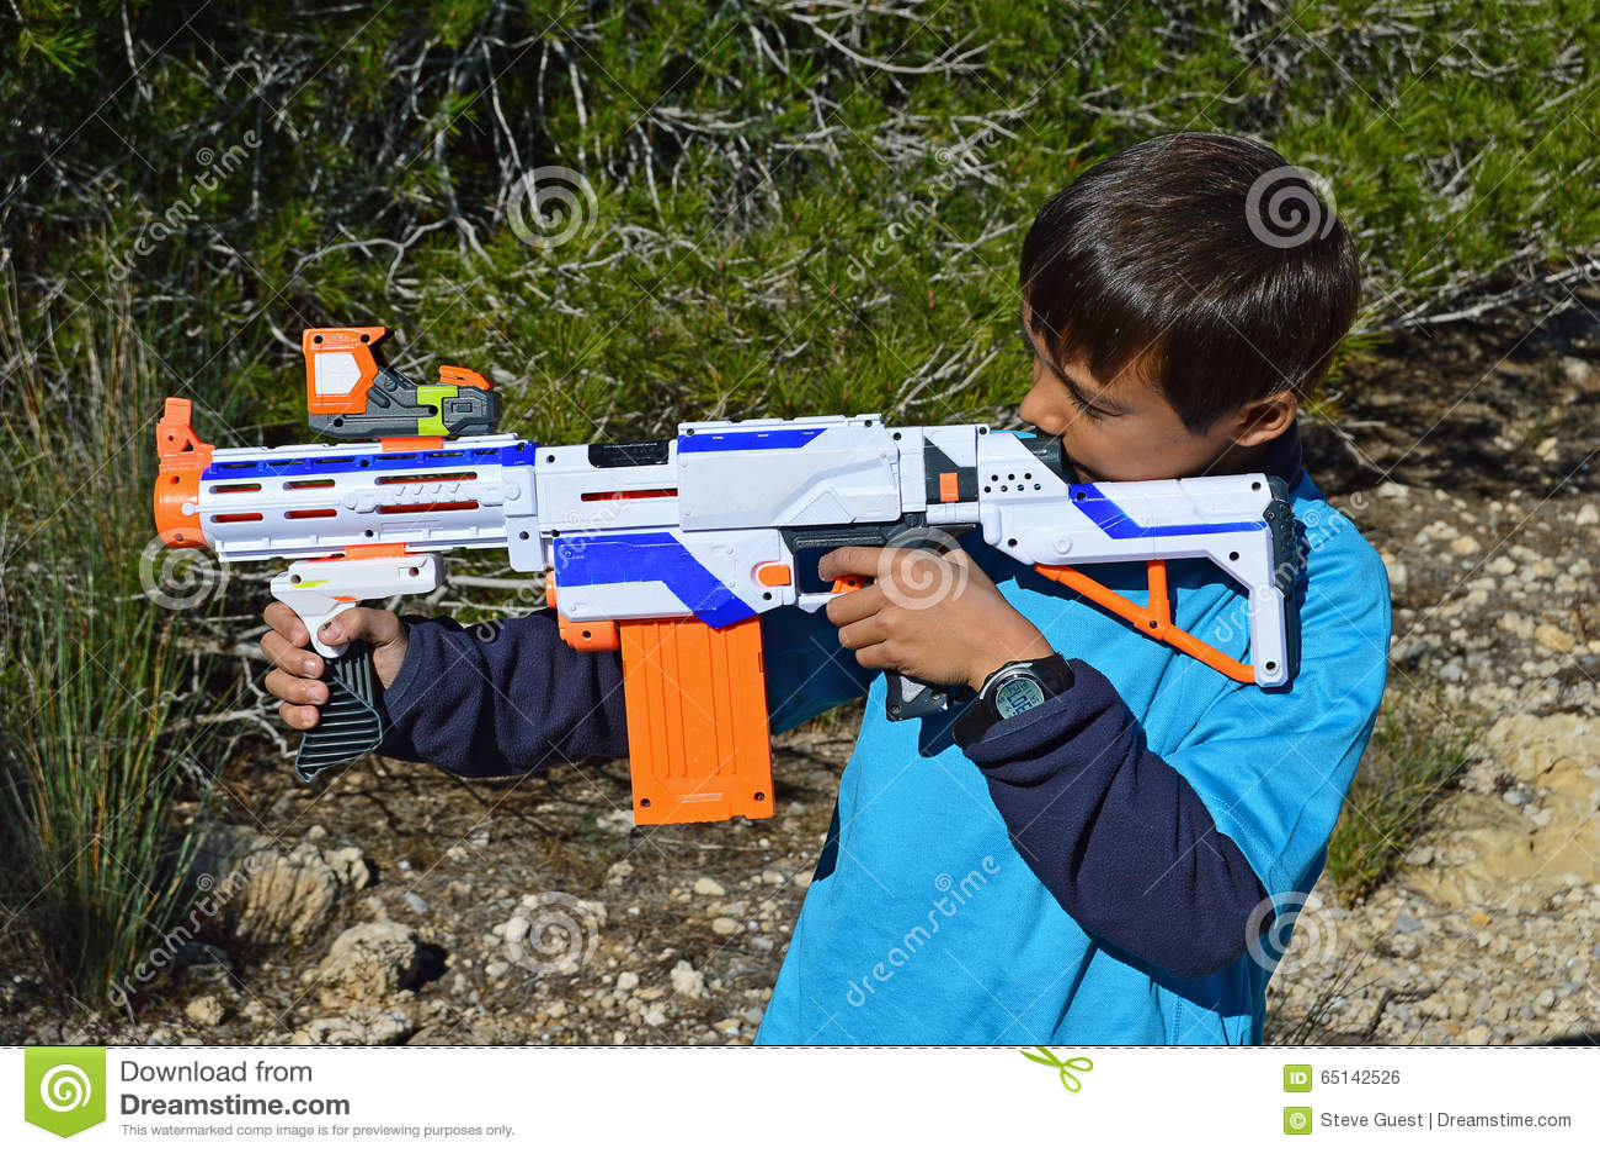 Toy Nerf Rifle